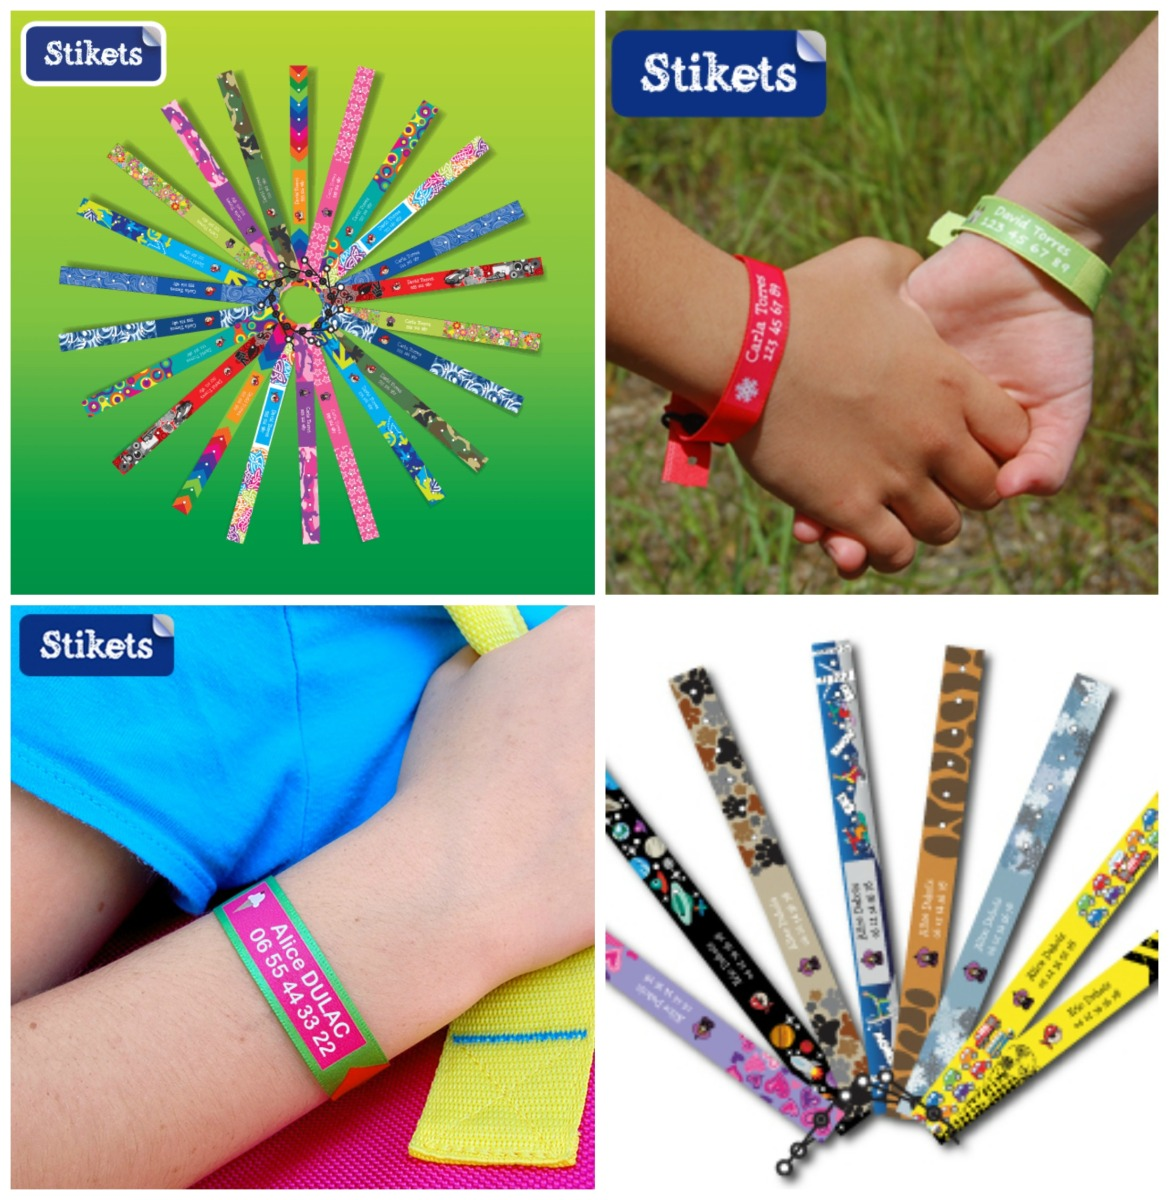 3 bracelets d'identification Stikets à gagner #1 - 4 ans du blog